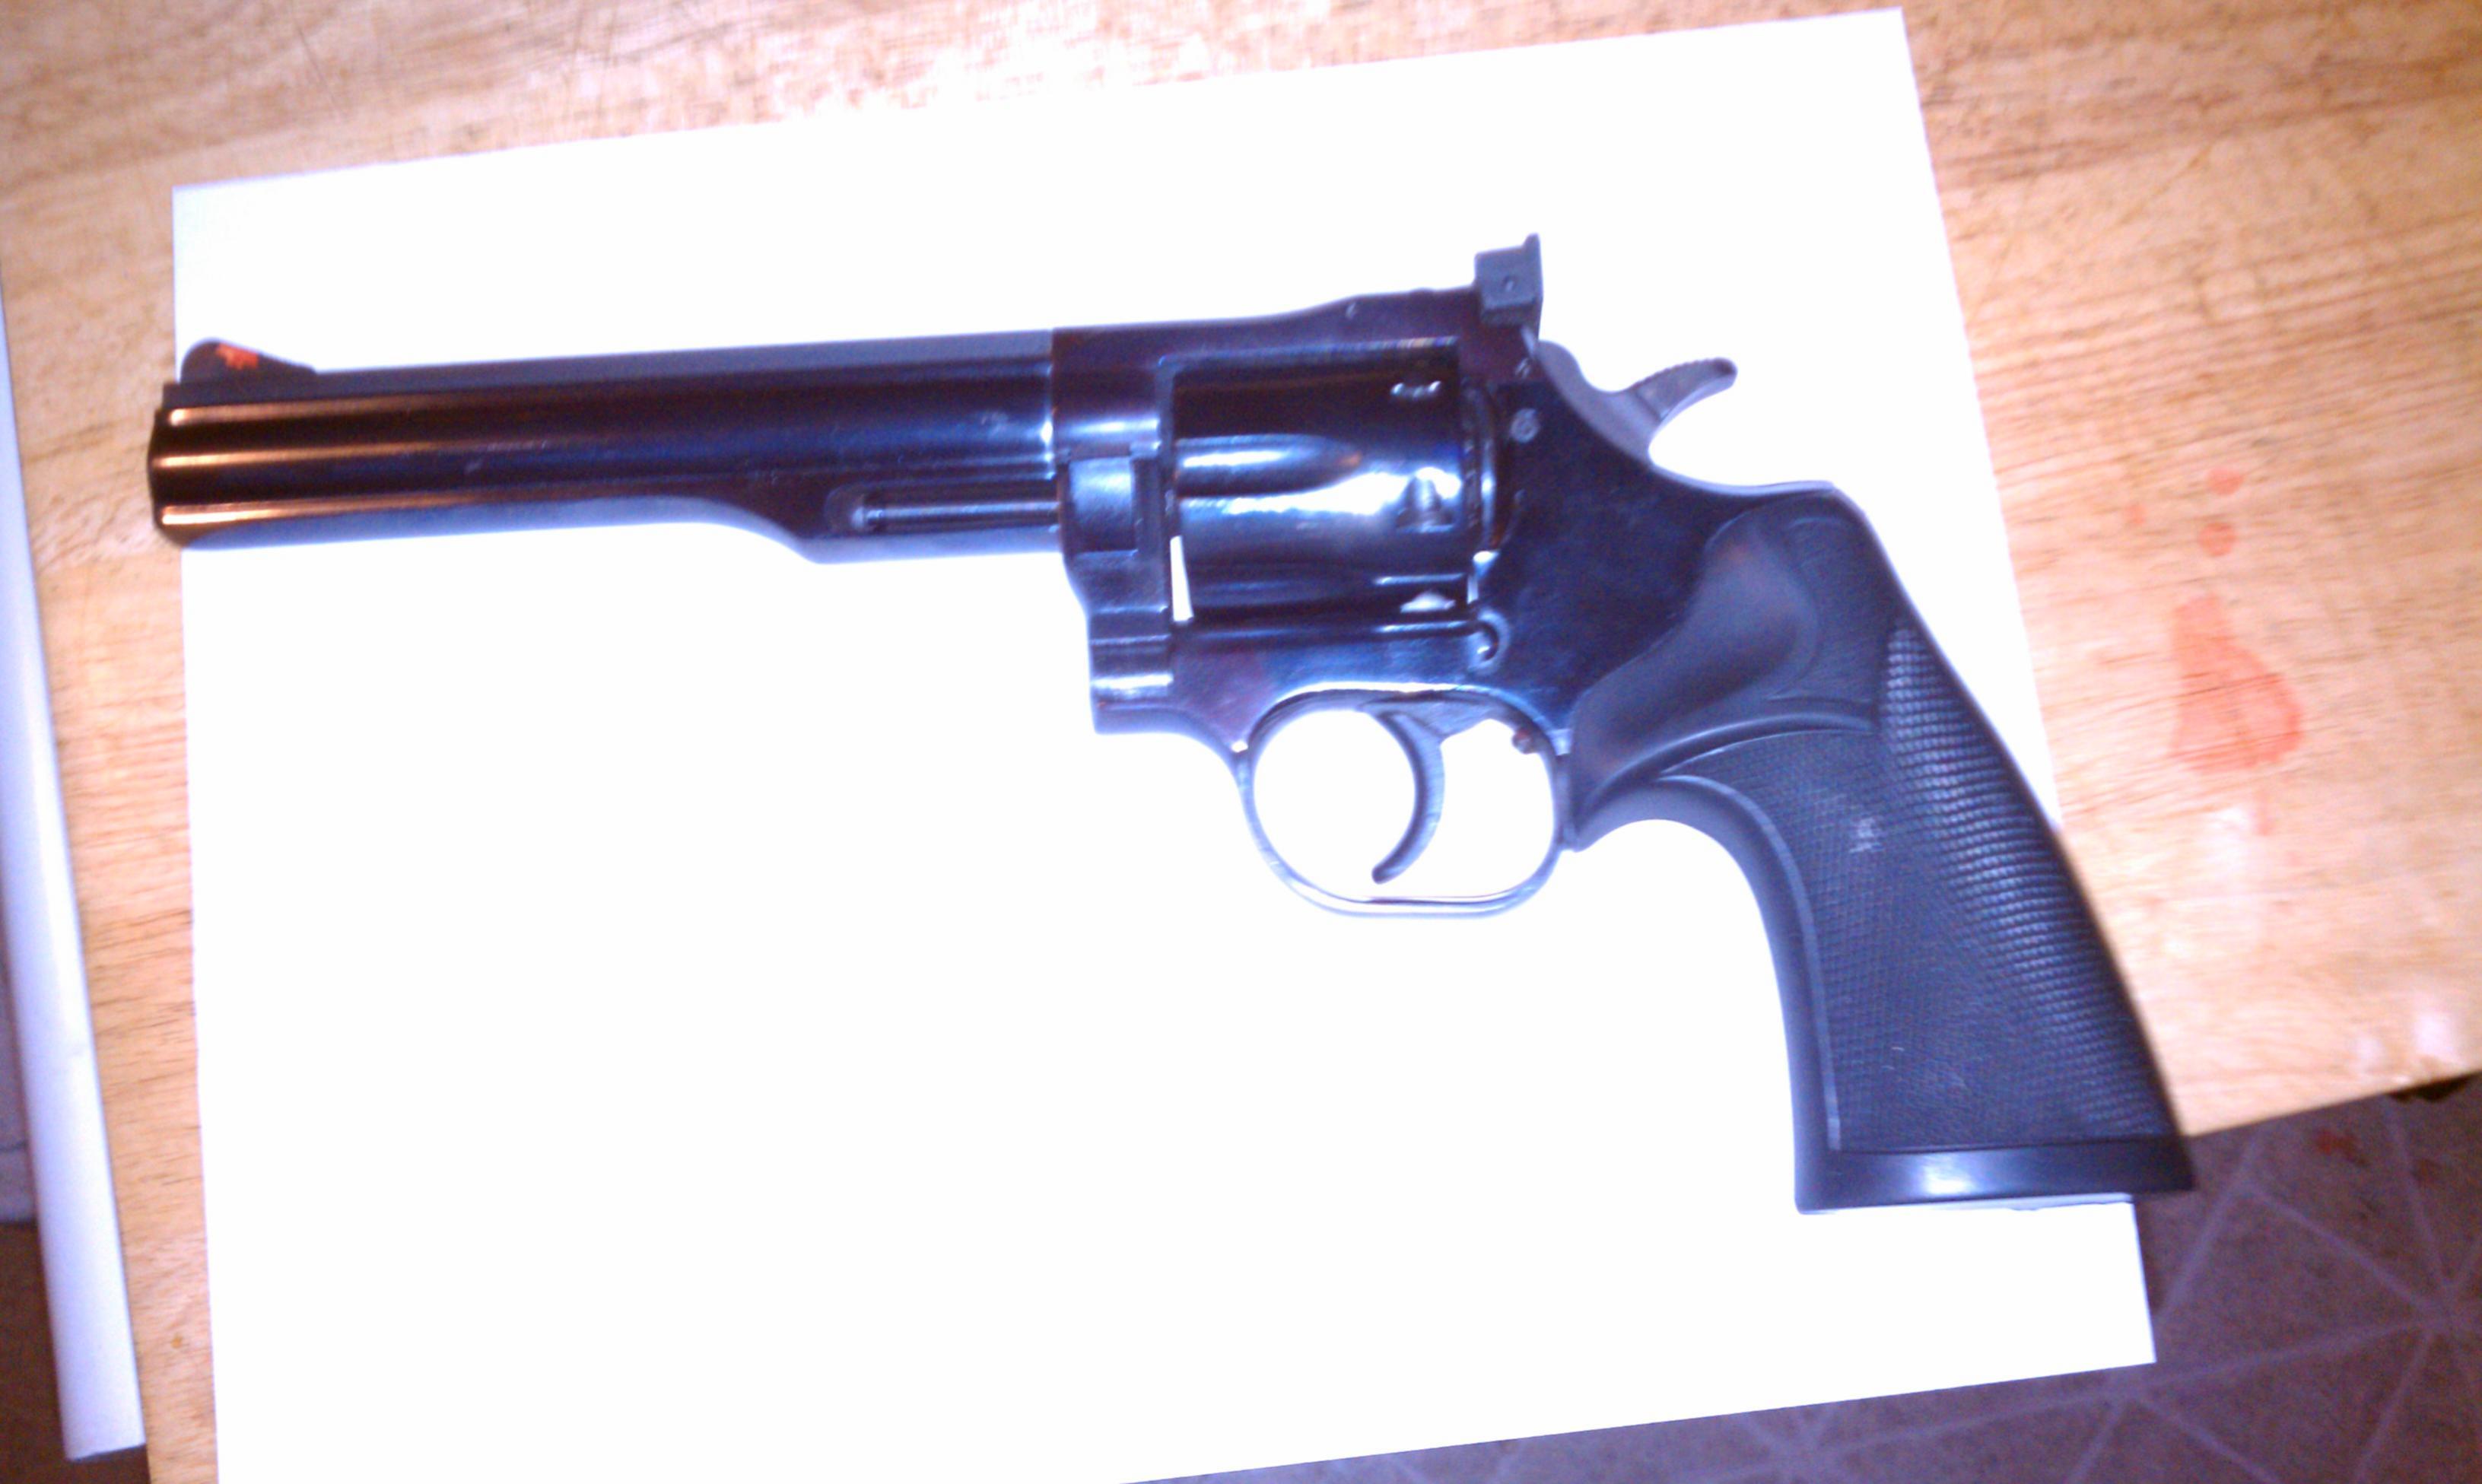 Opinions On Dan Wesson .357?-imag0089.jpg